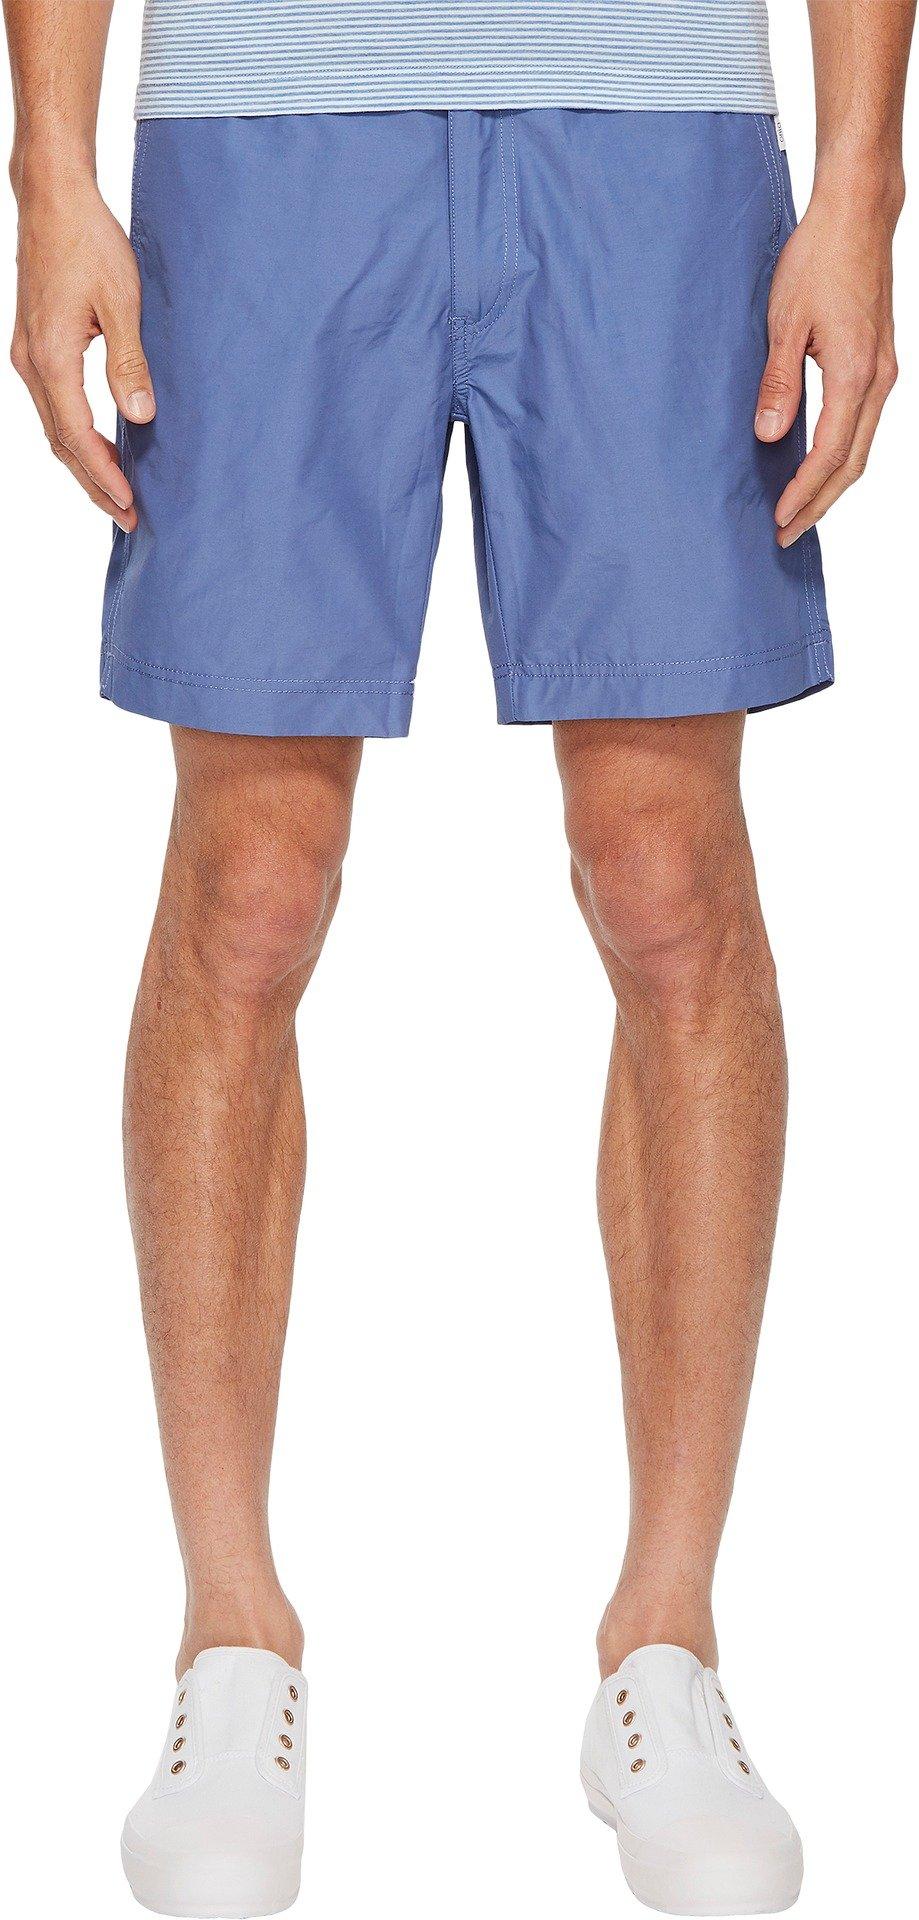 Onia Men's Petite Plus Calder 7.5 inch Solid Swim Trunk, Dutch Blue, 36